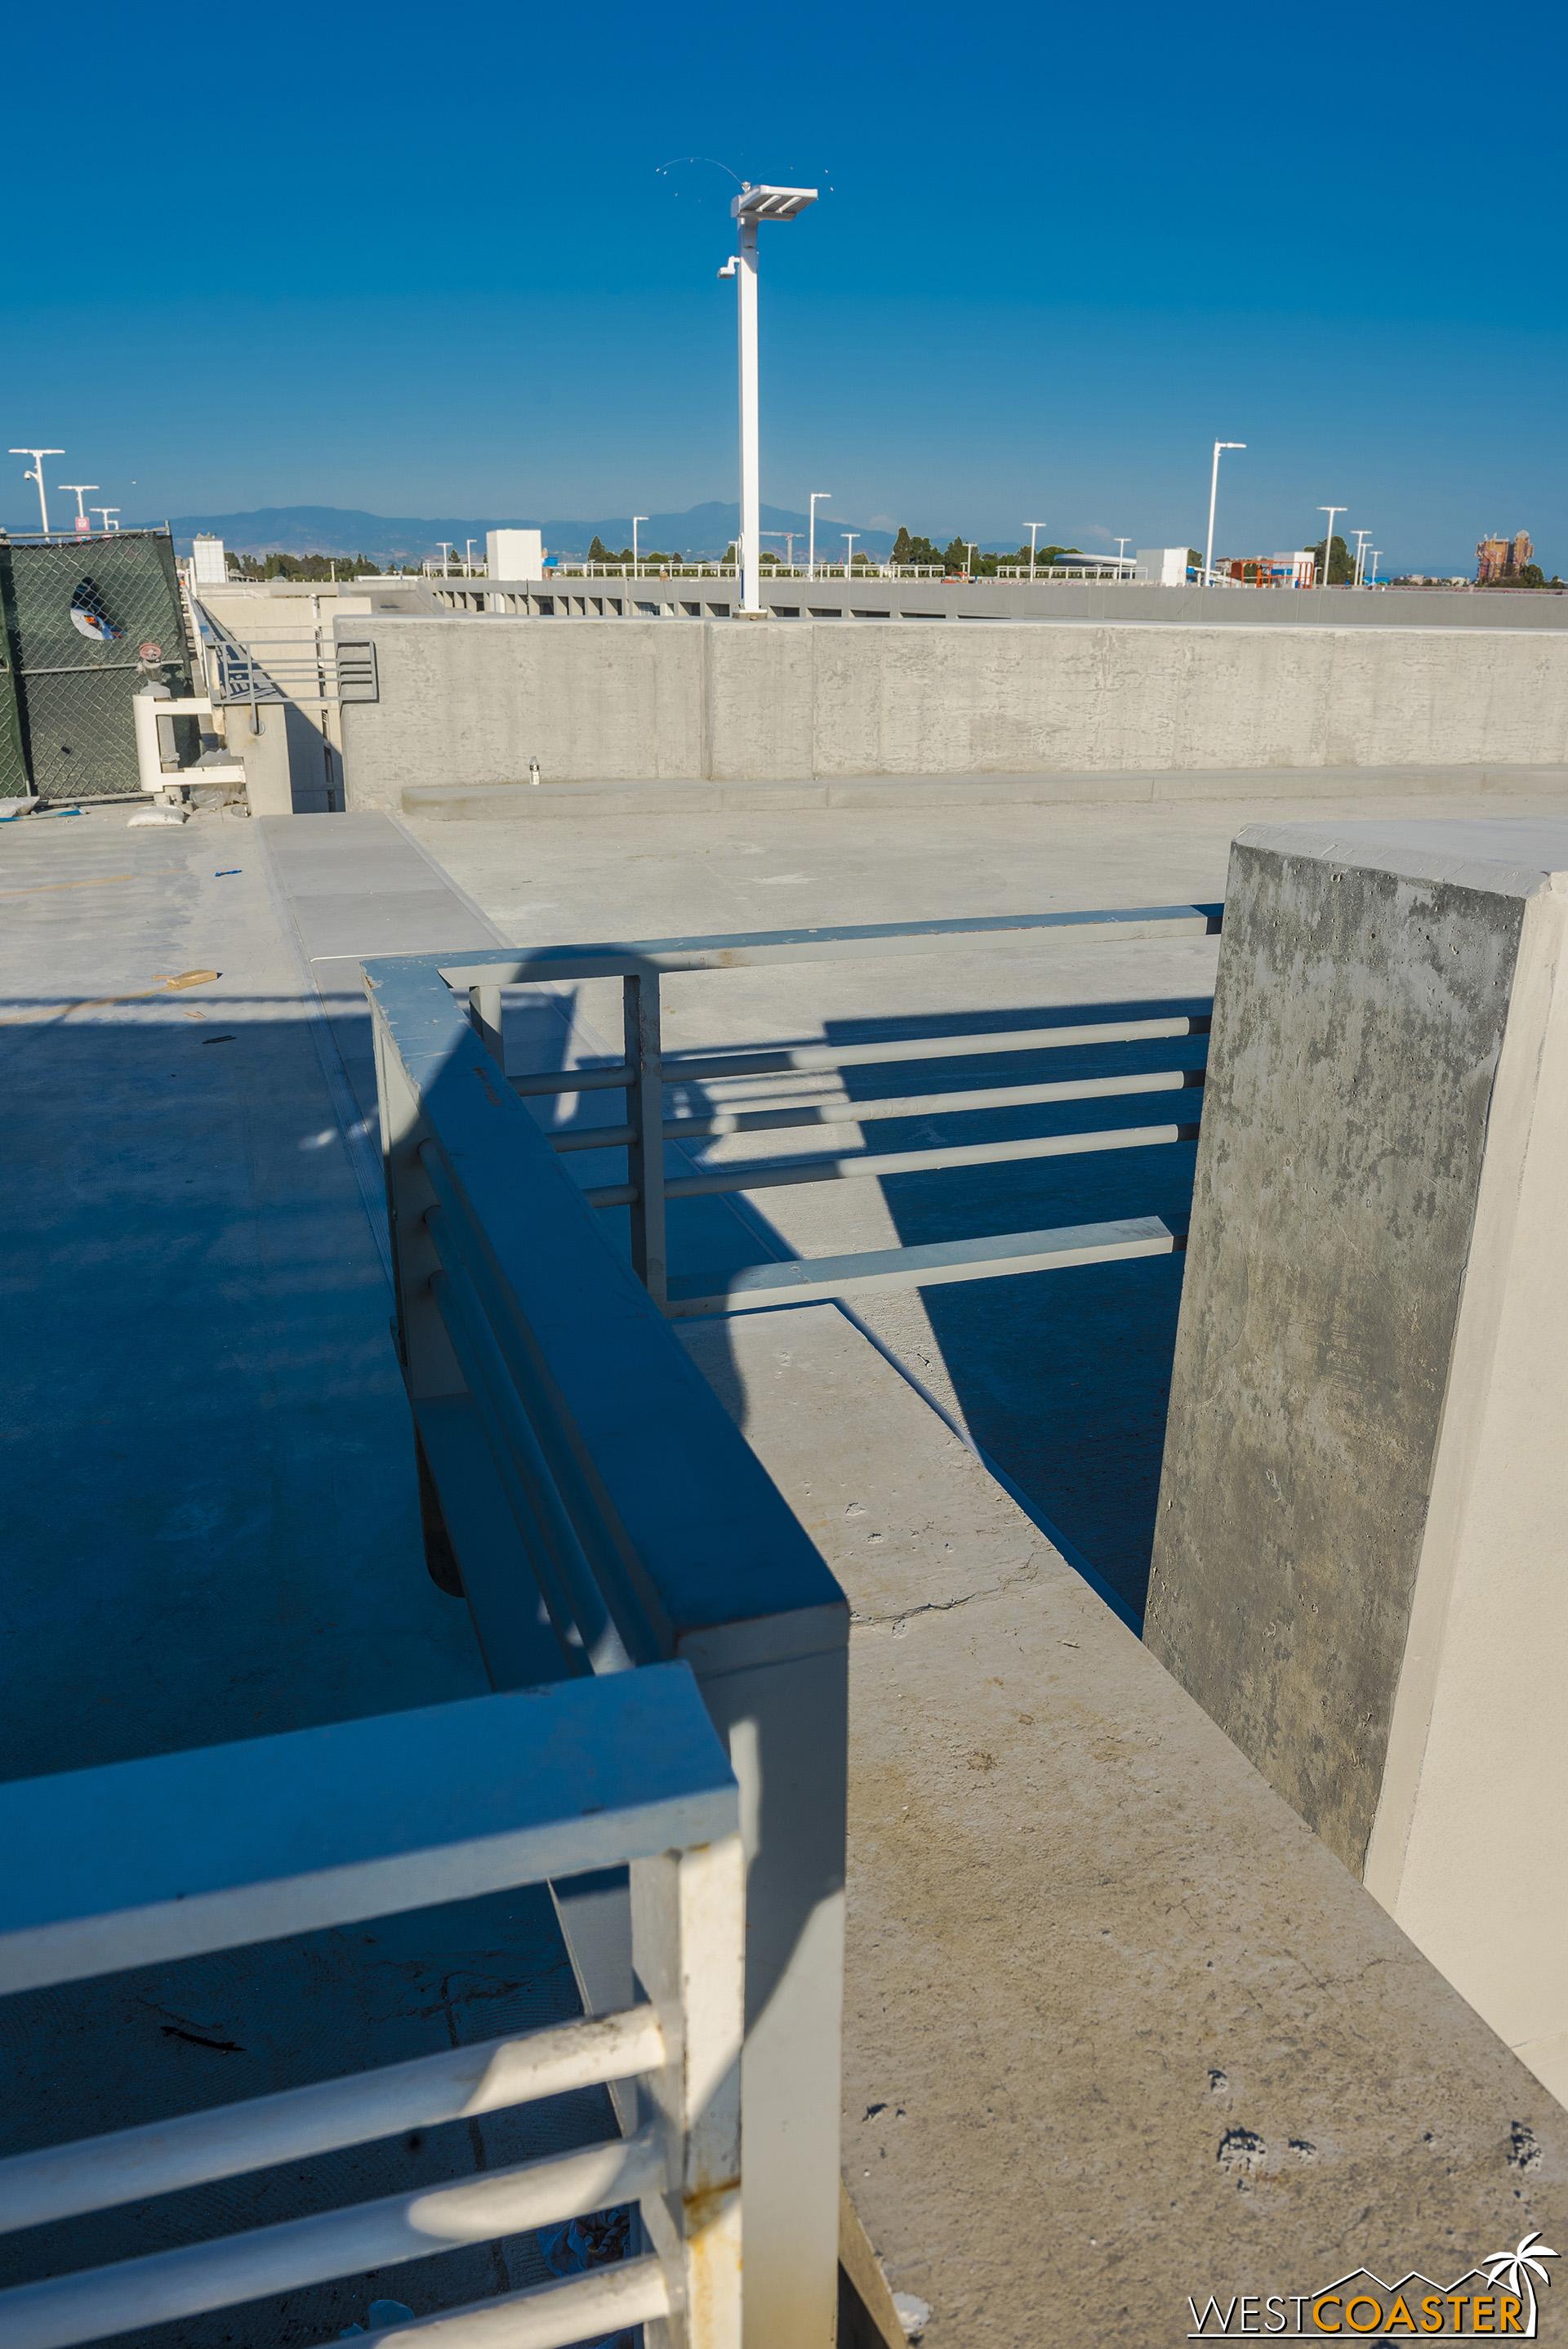 The guardrails shield the gap between concrete.